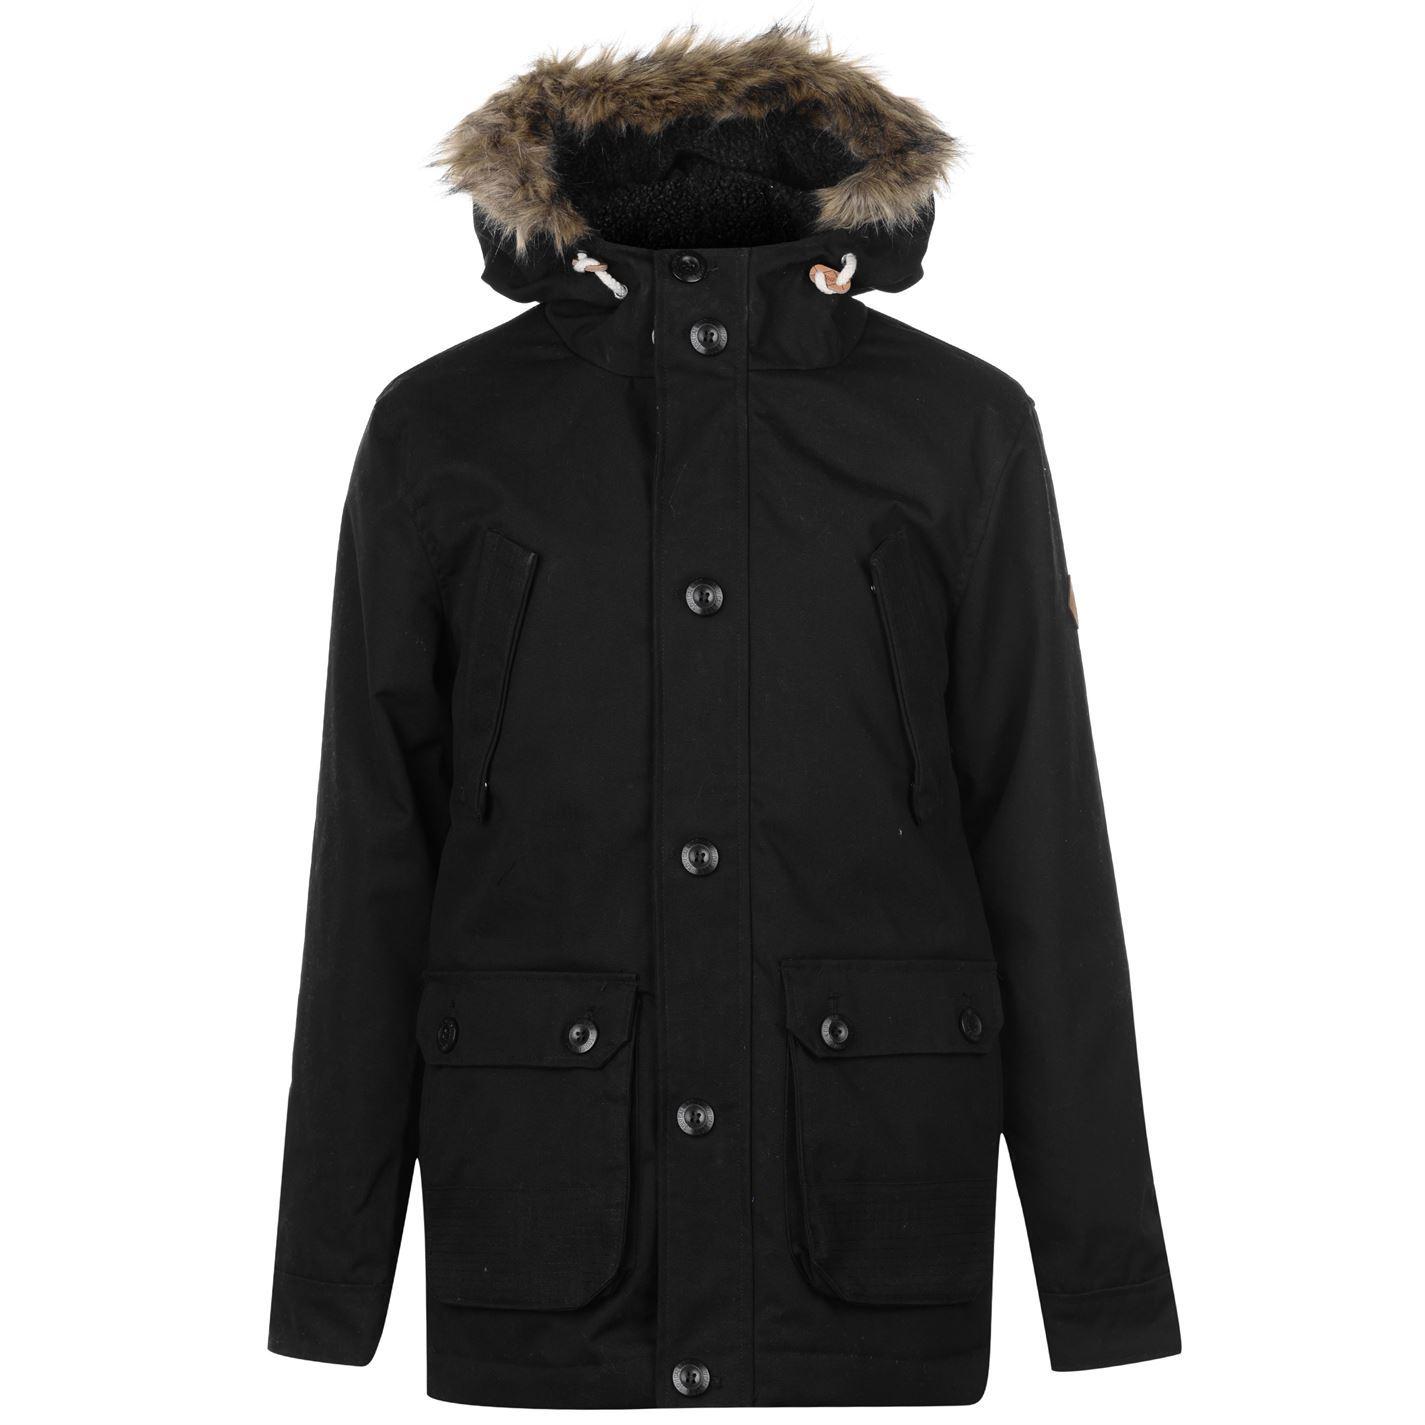 SoulCal-Mens-Parka-Jacket-Coat-Top-Long-Sleeve-